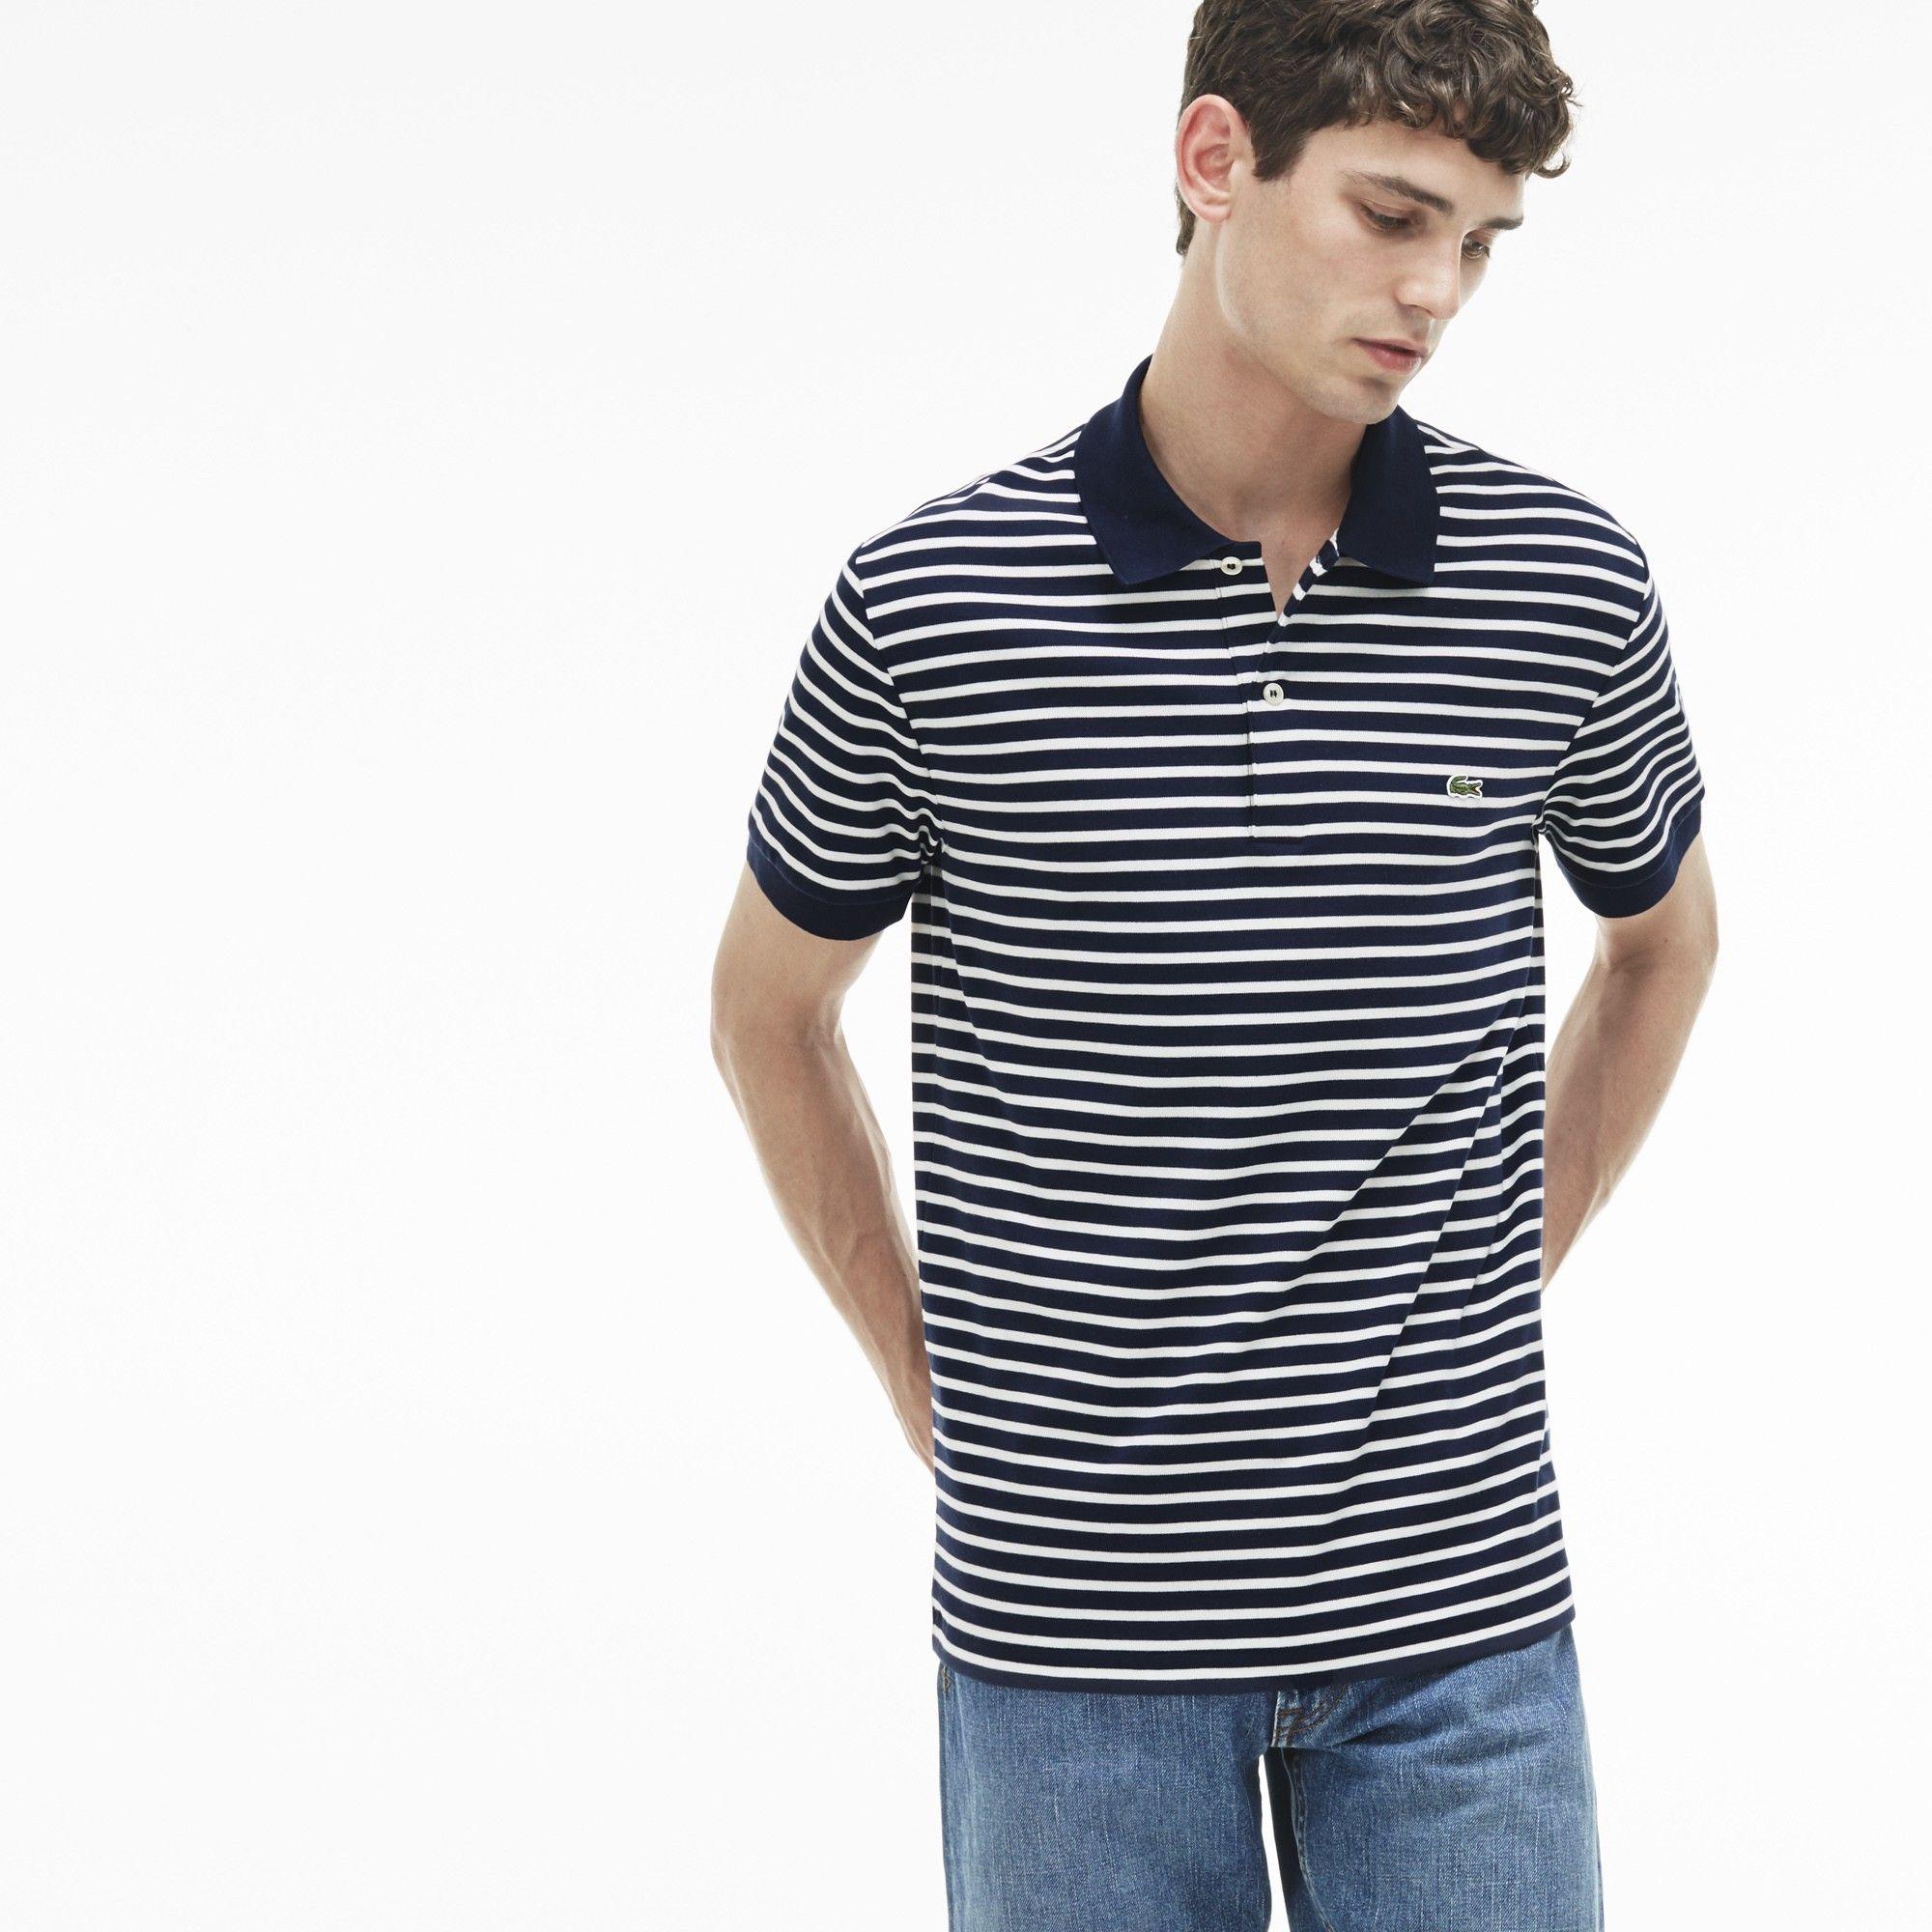 f1f7dcf6c1 LACOSTE Men's Regular Fit Striped Pima Cotton Polo - navy blue/cake ...